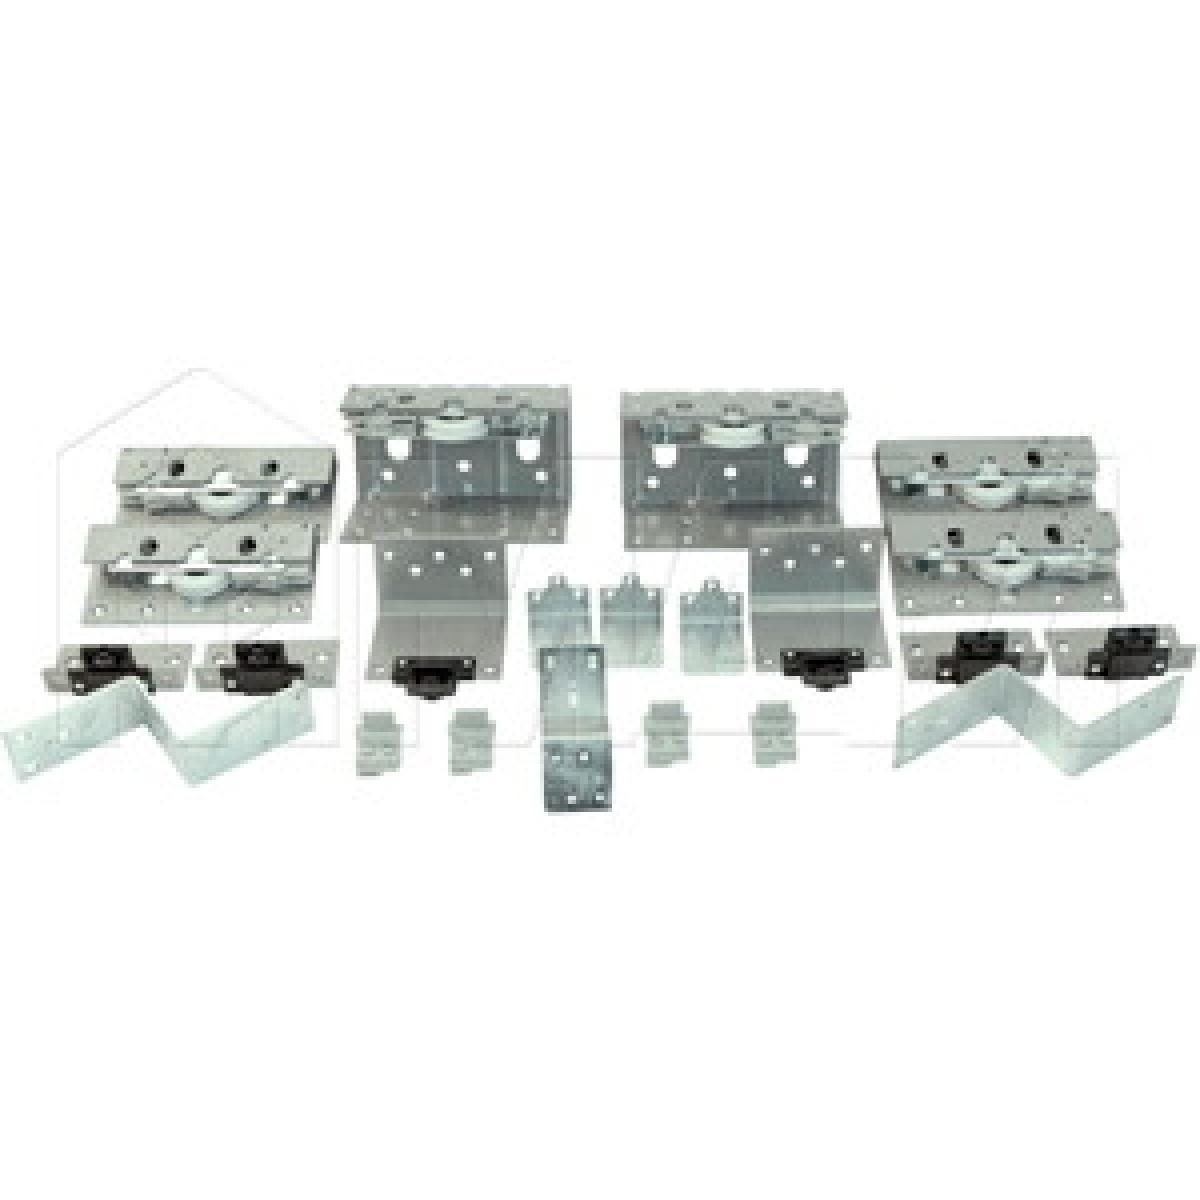 PS10 Комплект роликов для трехдверного шкафа с электроприводом, толщина фасада до 23 мм